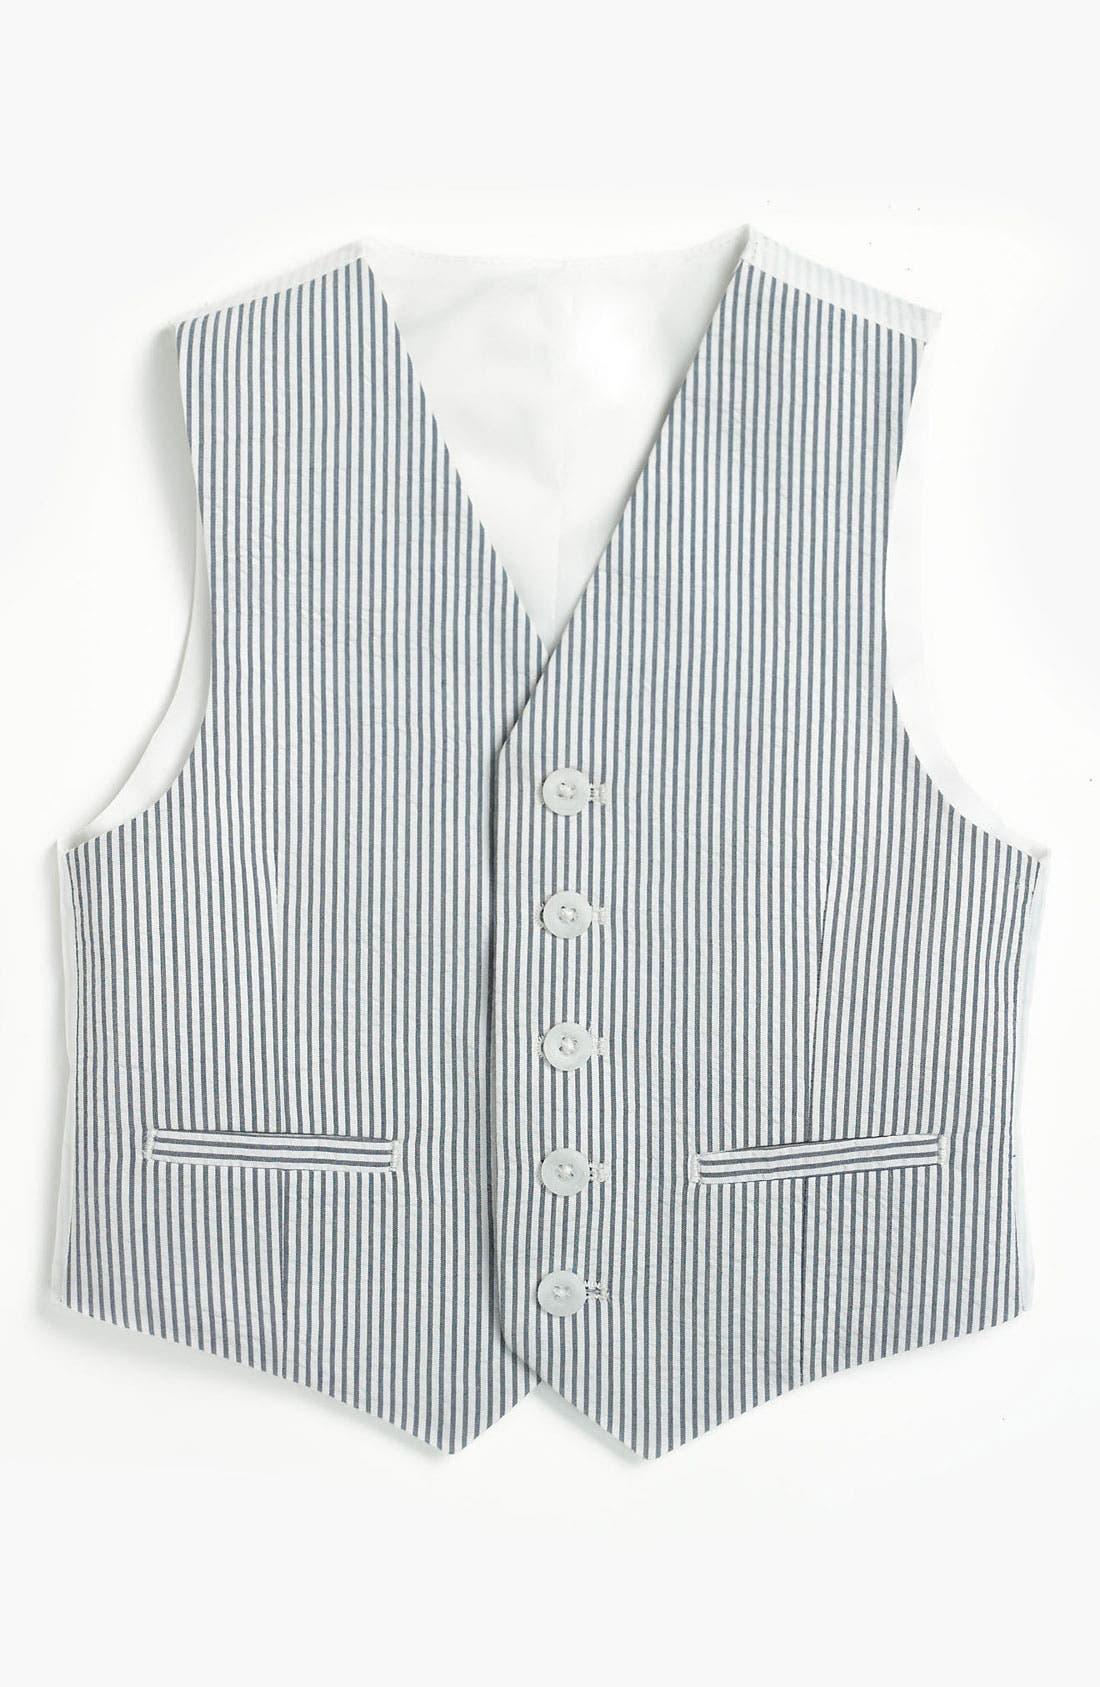 Main Image - Nordstrom 'Andrew' Vest (Little Boys & Big Boys)